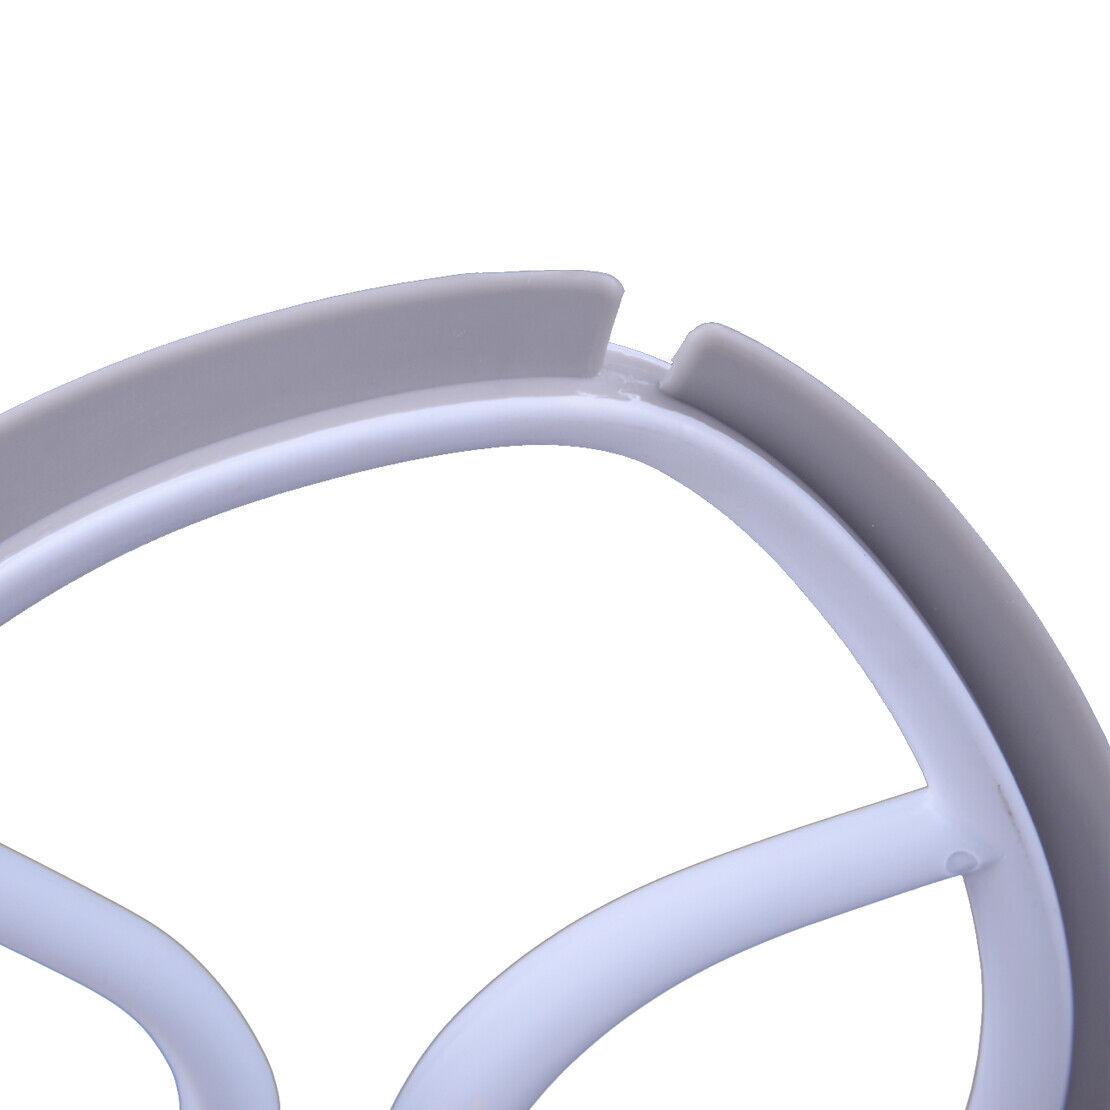 1x Mixer Attachments Blade Fit  Fold KitchenAid 5 Quart Bowl-Lift Scrape Beat